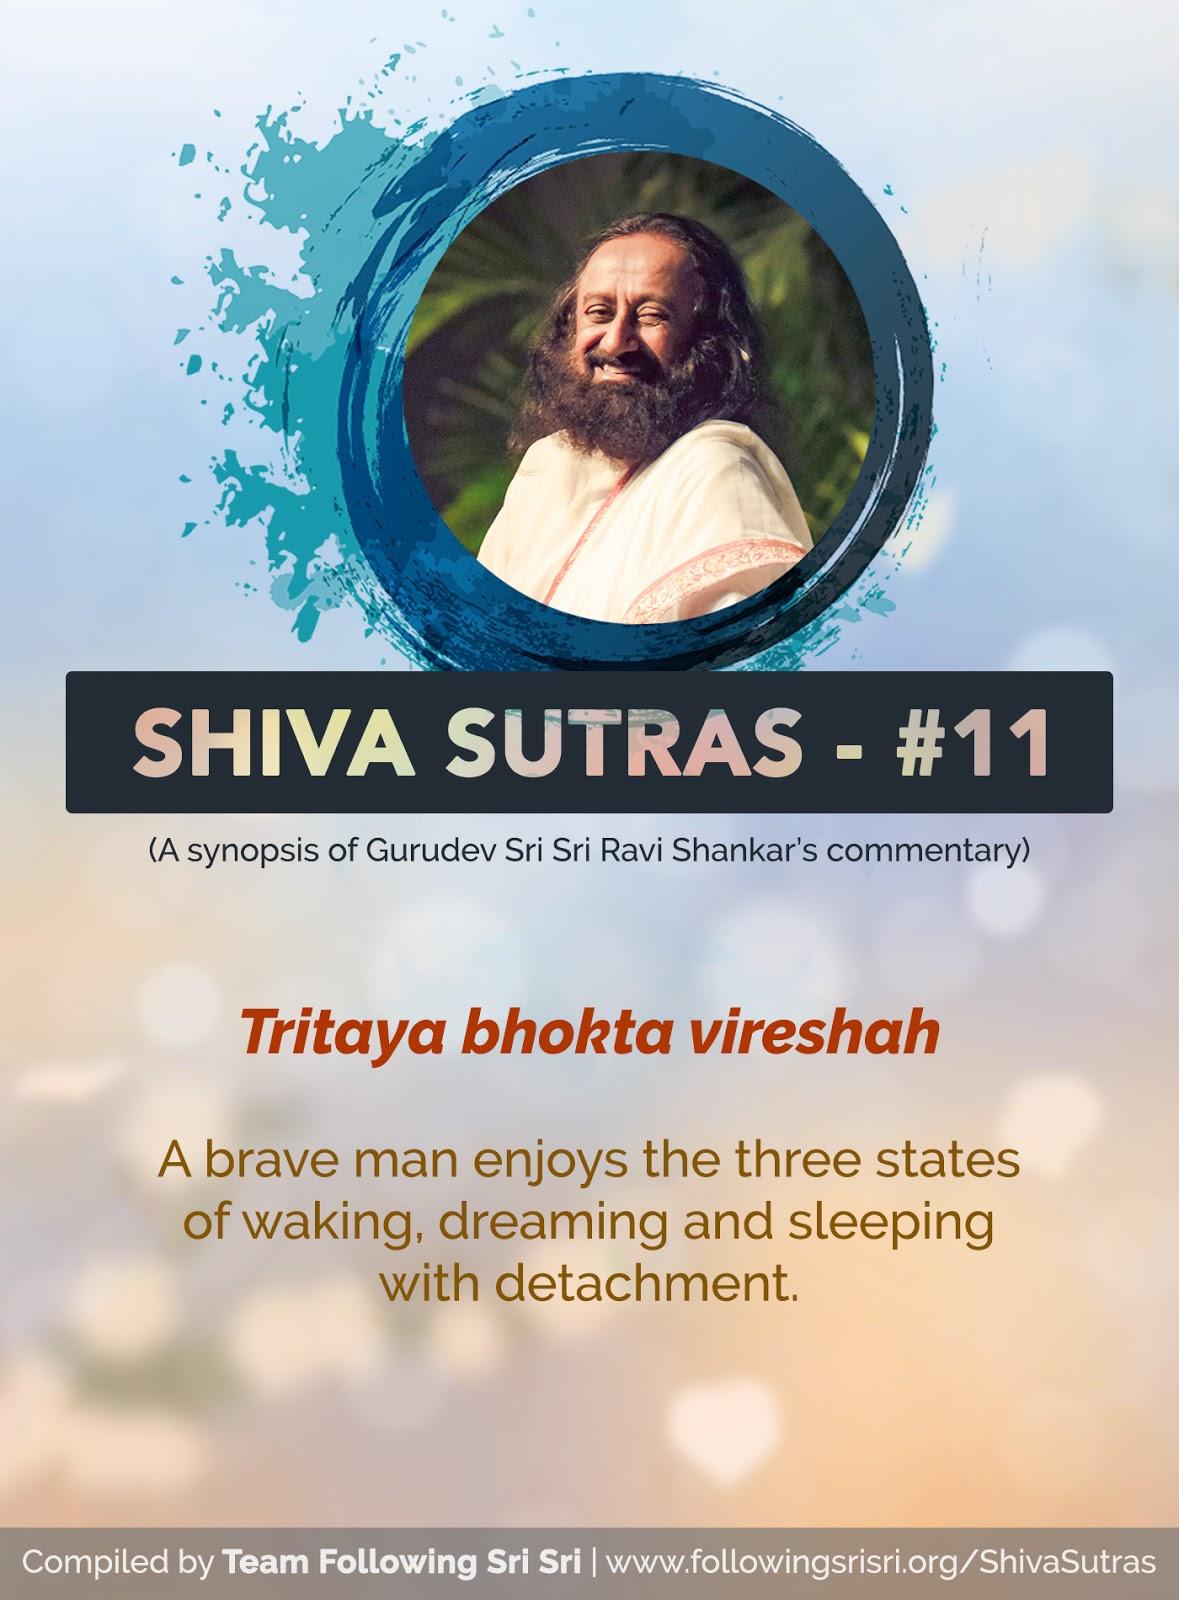 Shiva Sutras - Sutra 11